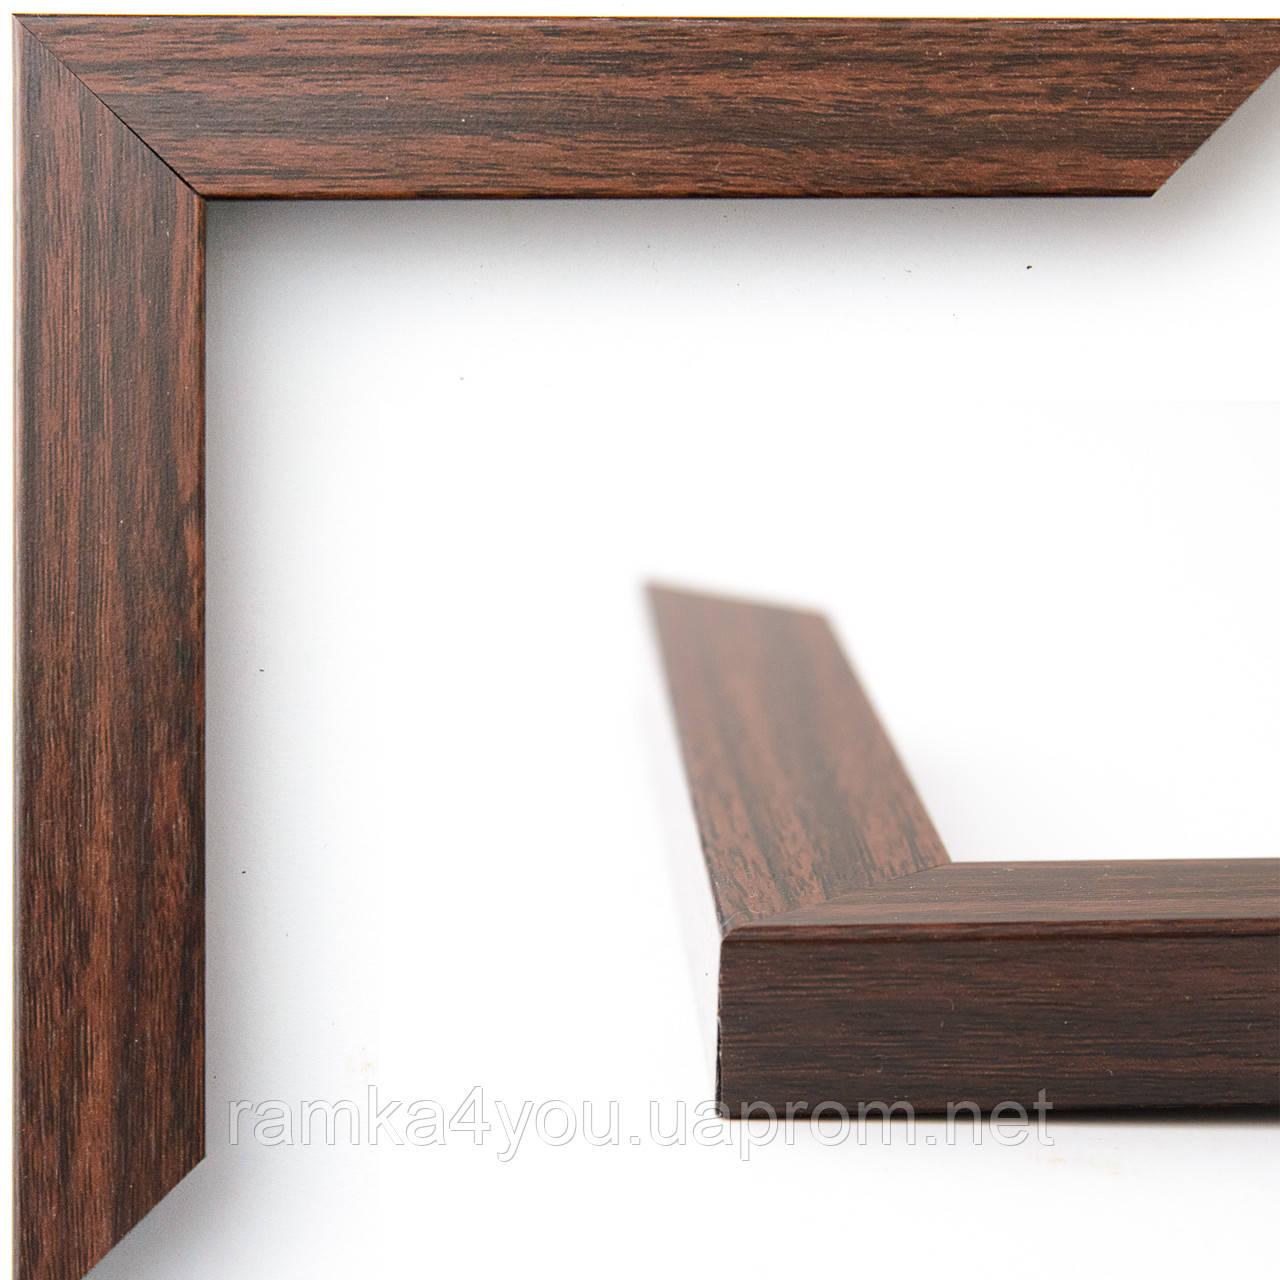 Рамка 40х50 2216-46MF коричневая